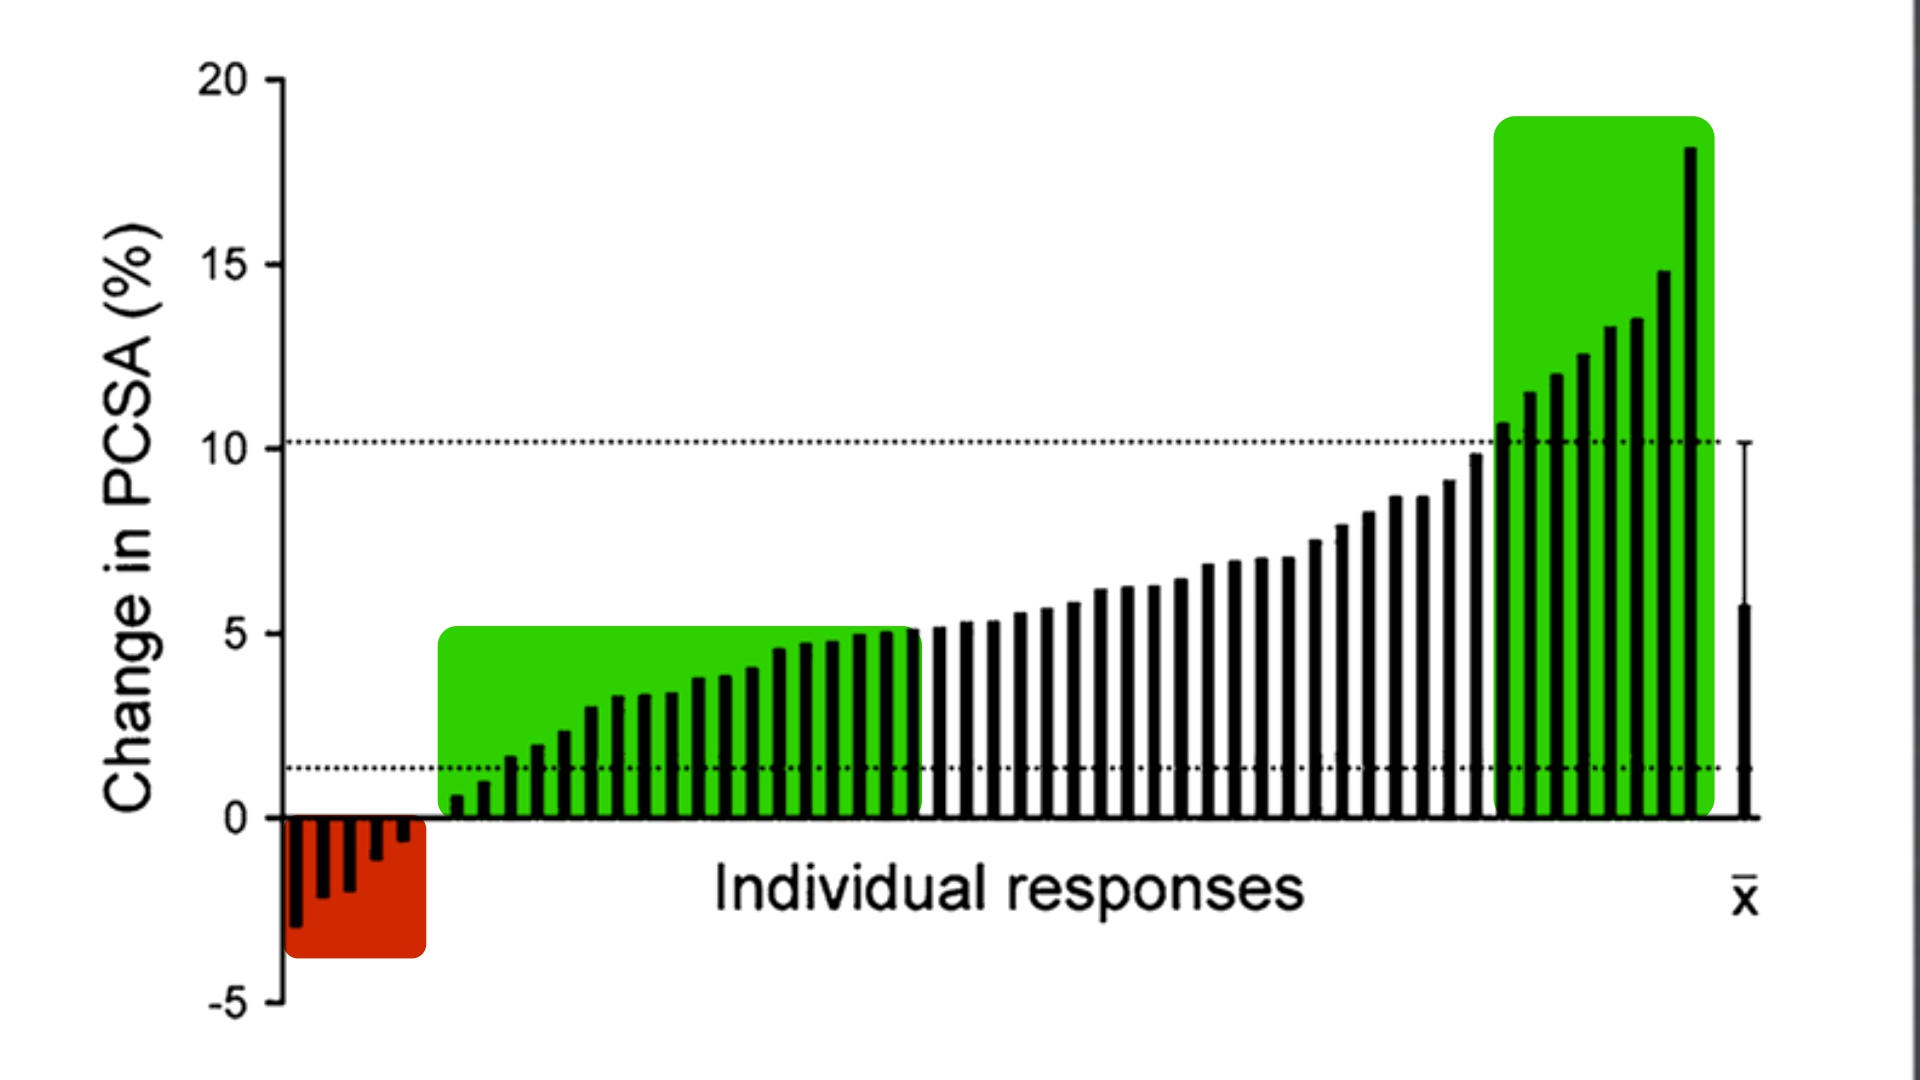 genetic_potential_erskine_et_al_individual_responces